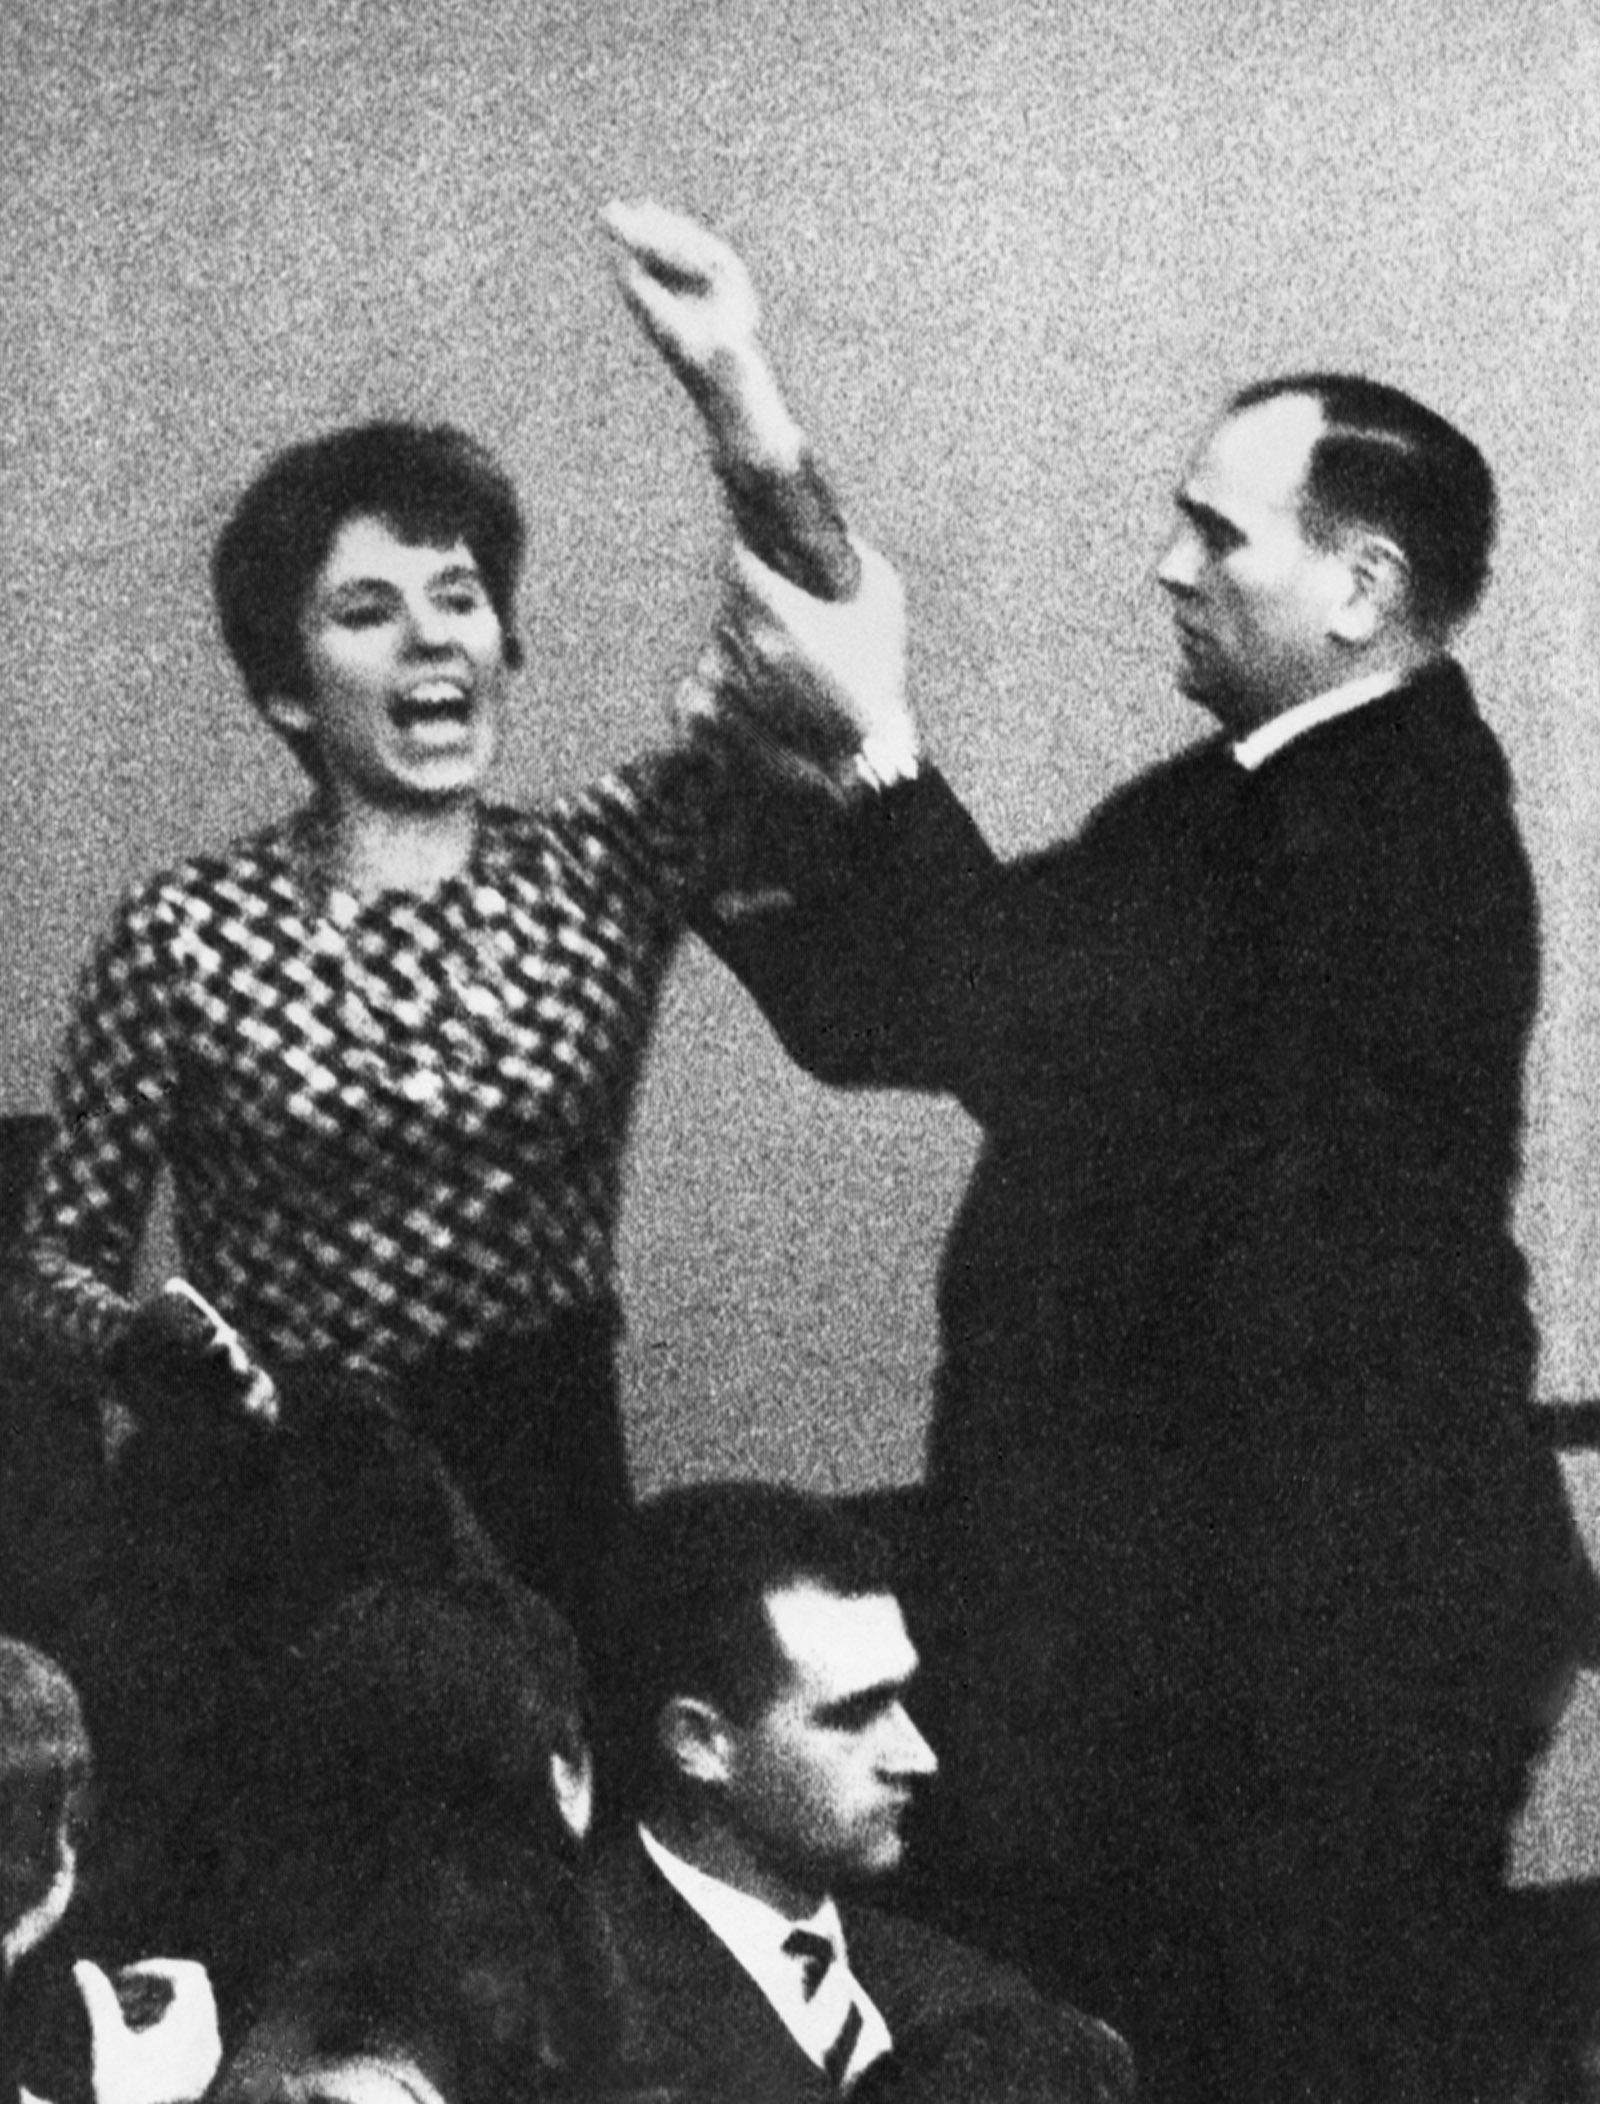 Beate Klarsfeld interrupting the West German chancellor in the Bundestag to shout 'Kiesinger, Nazi, resign!,' Bonn, April 1968